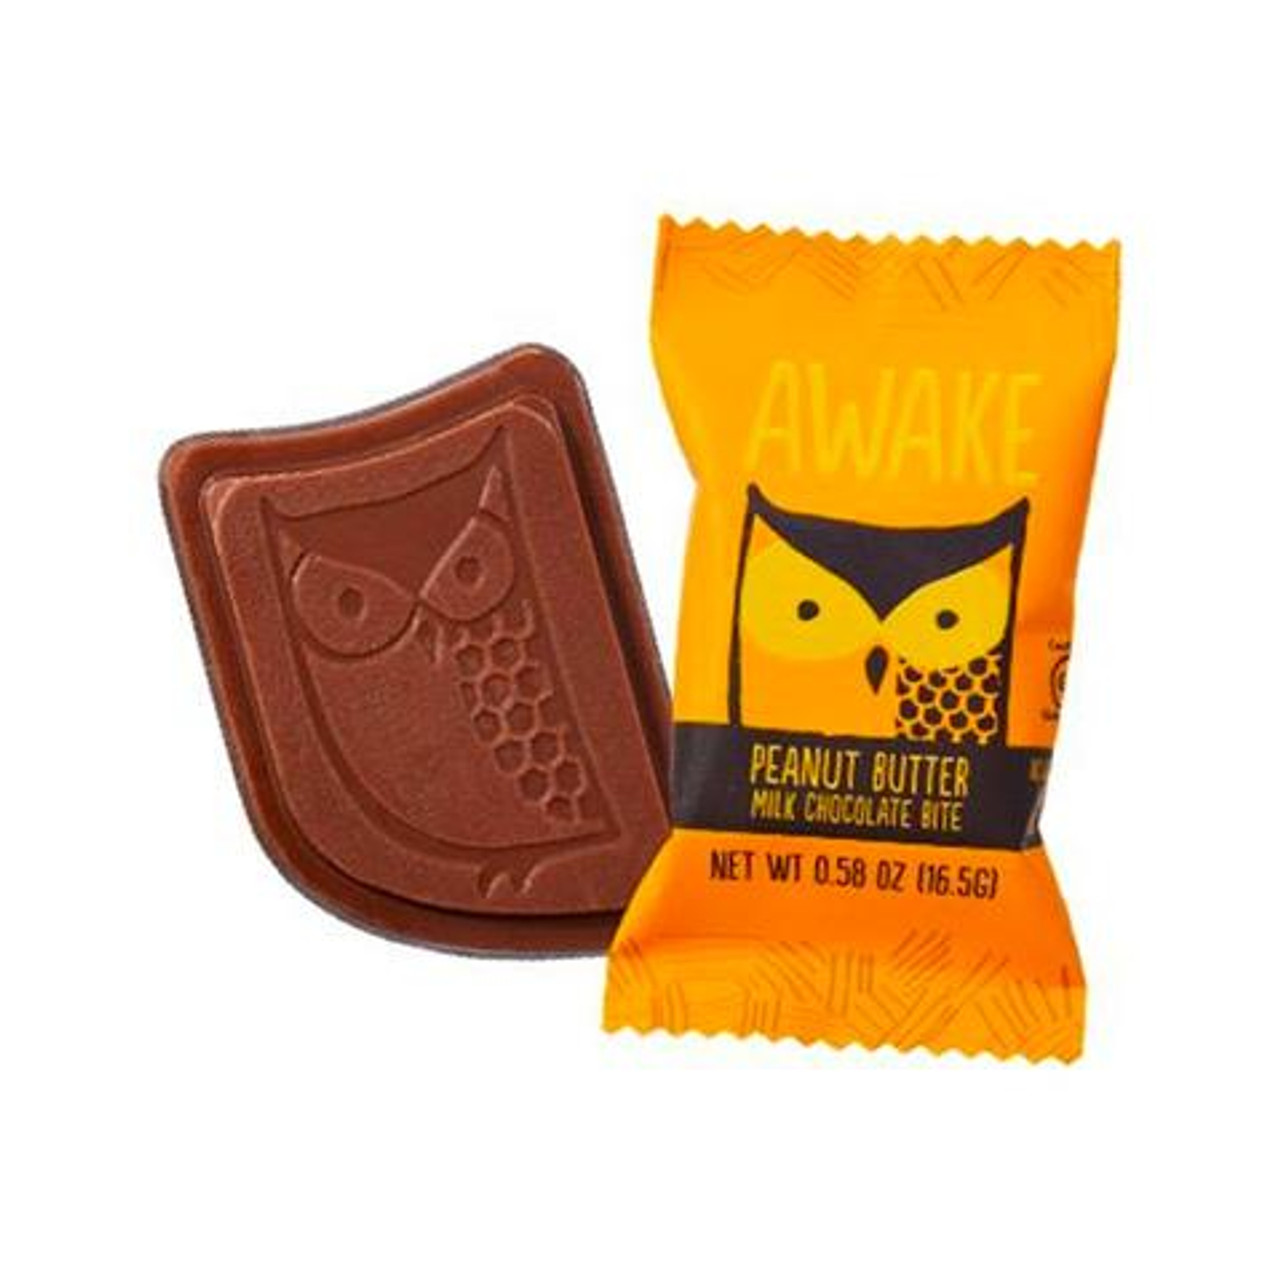 Awake Caffeinated Peanut Butter Chocolate Bites